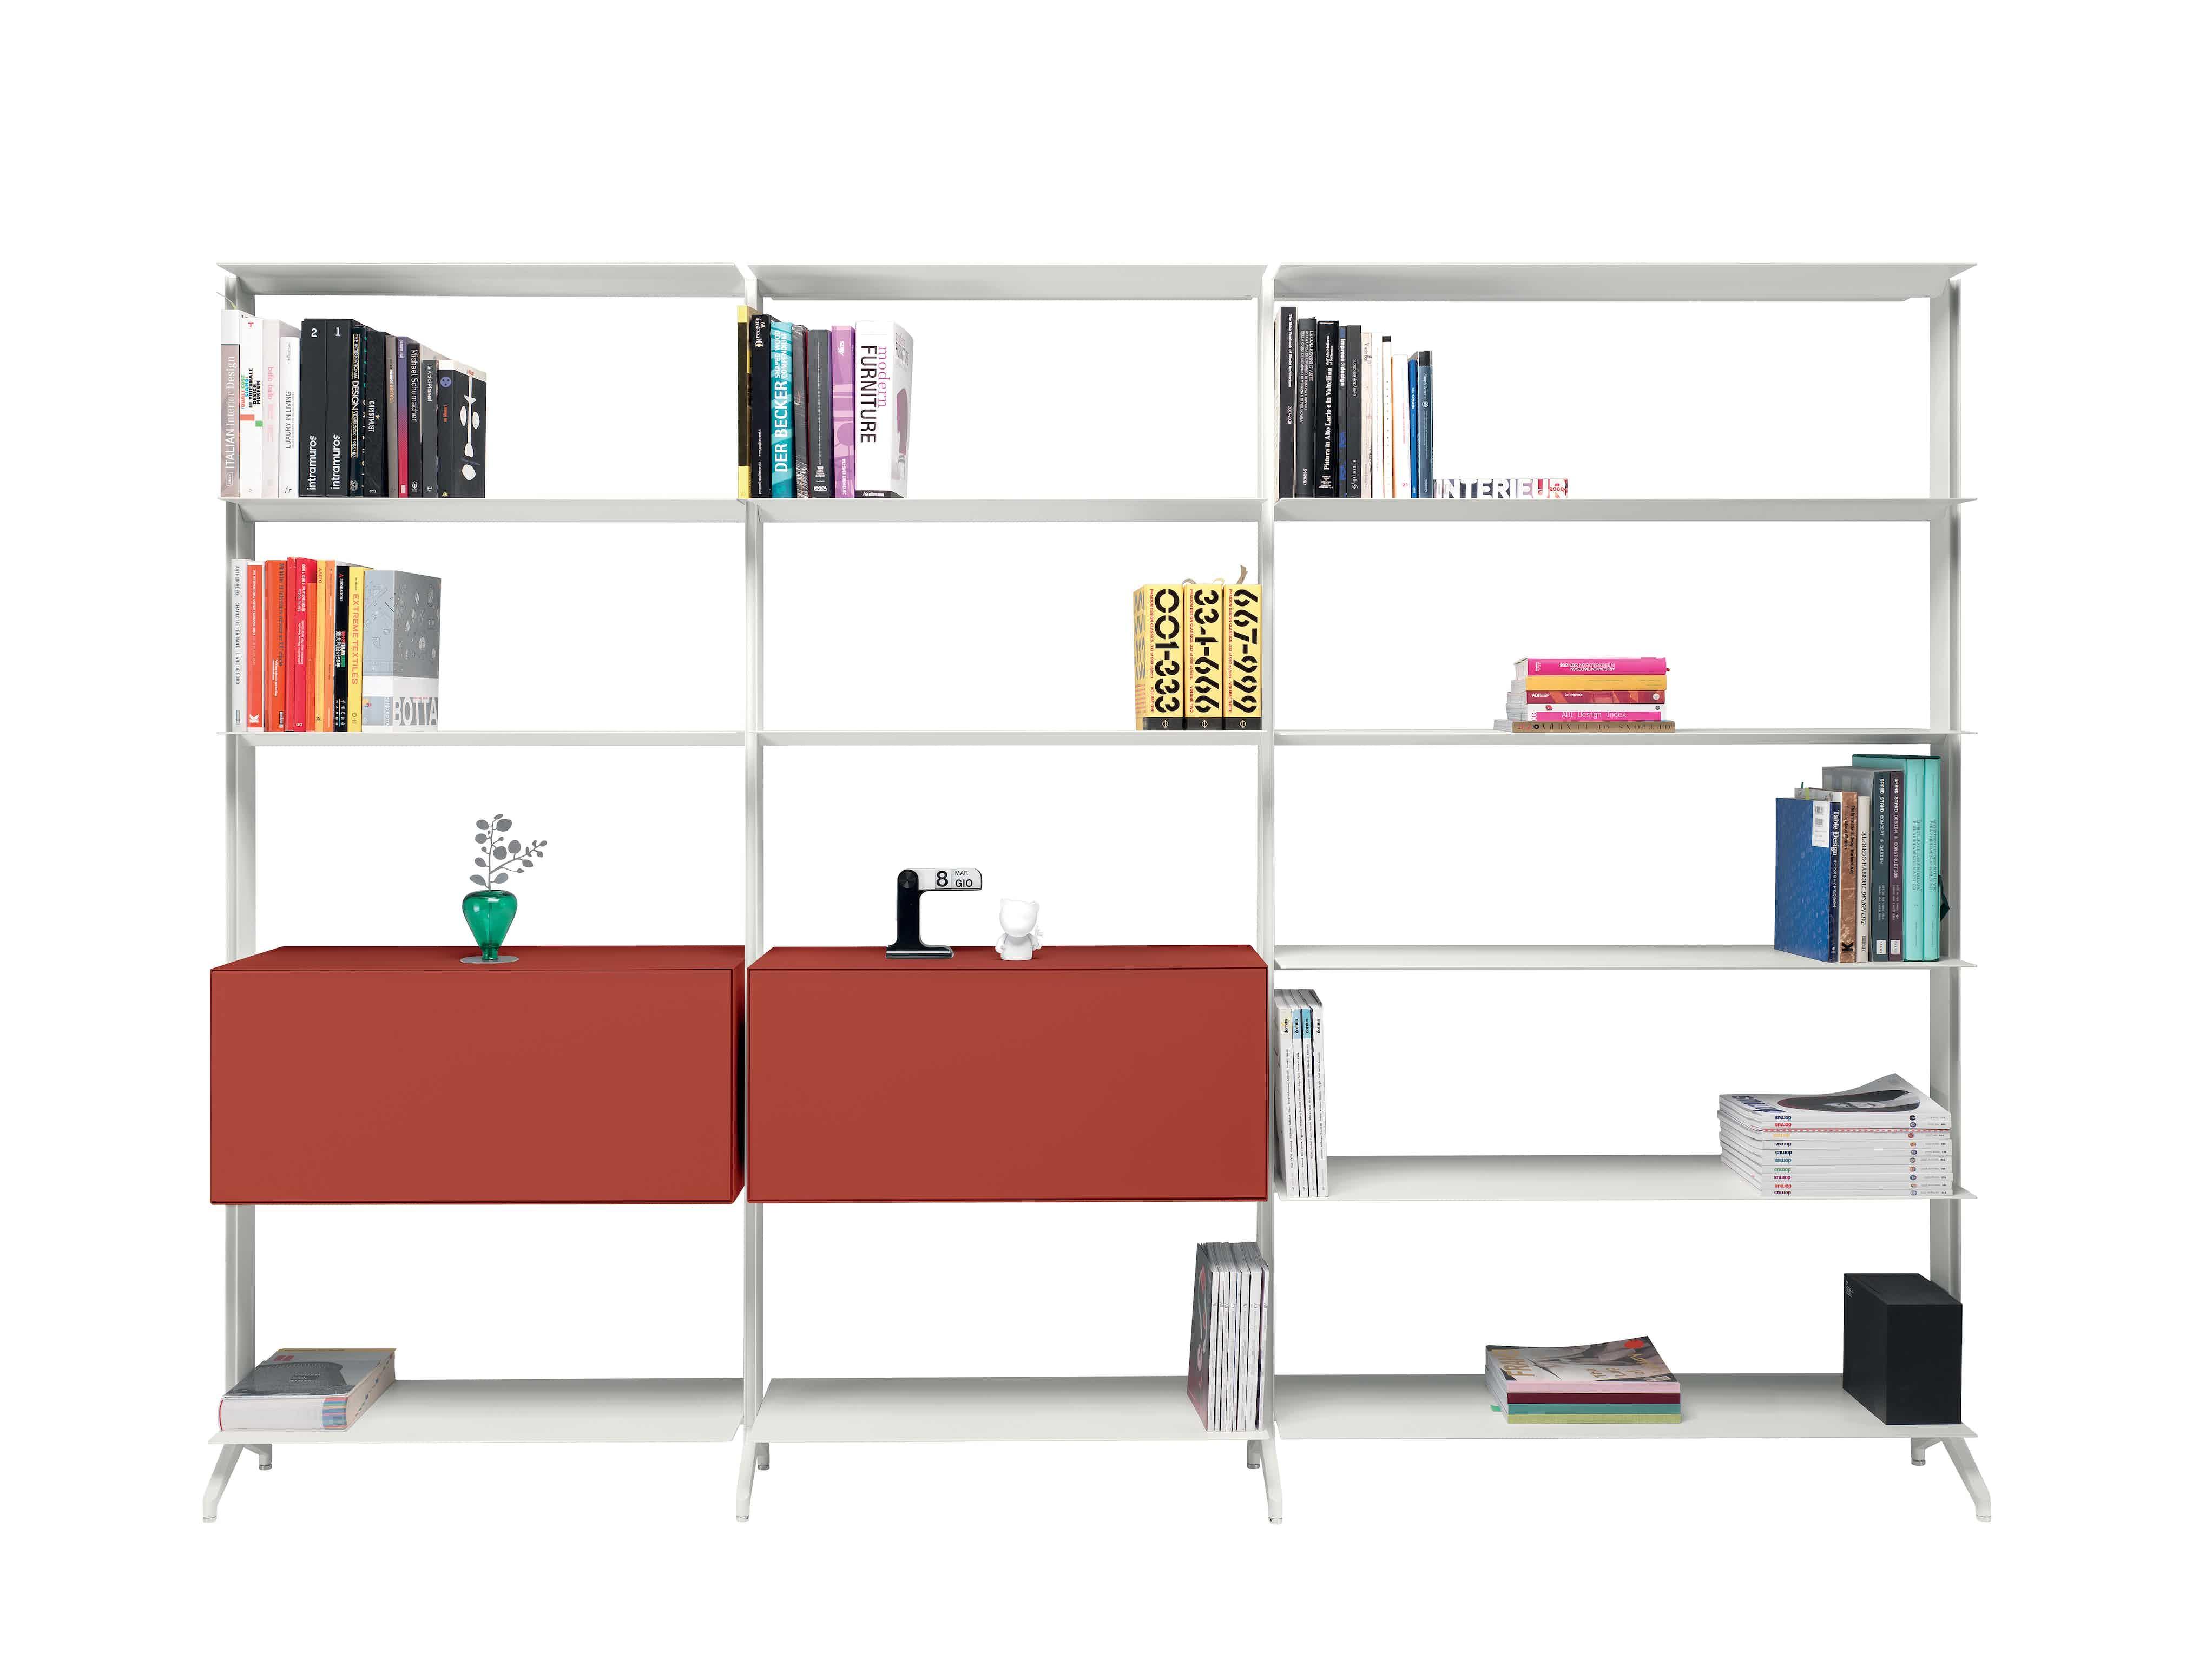 Alias-furniture-aline-shelving-system-red-drawers-haute-living